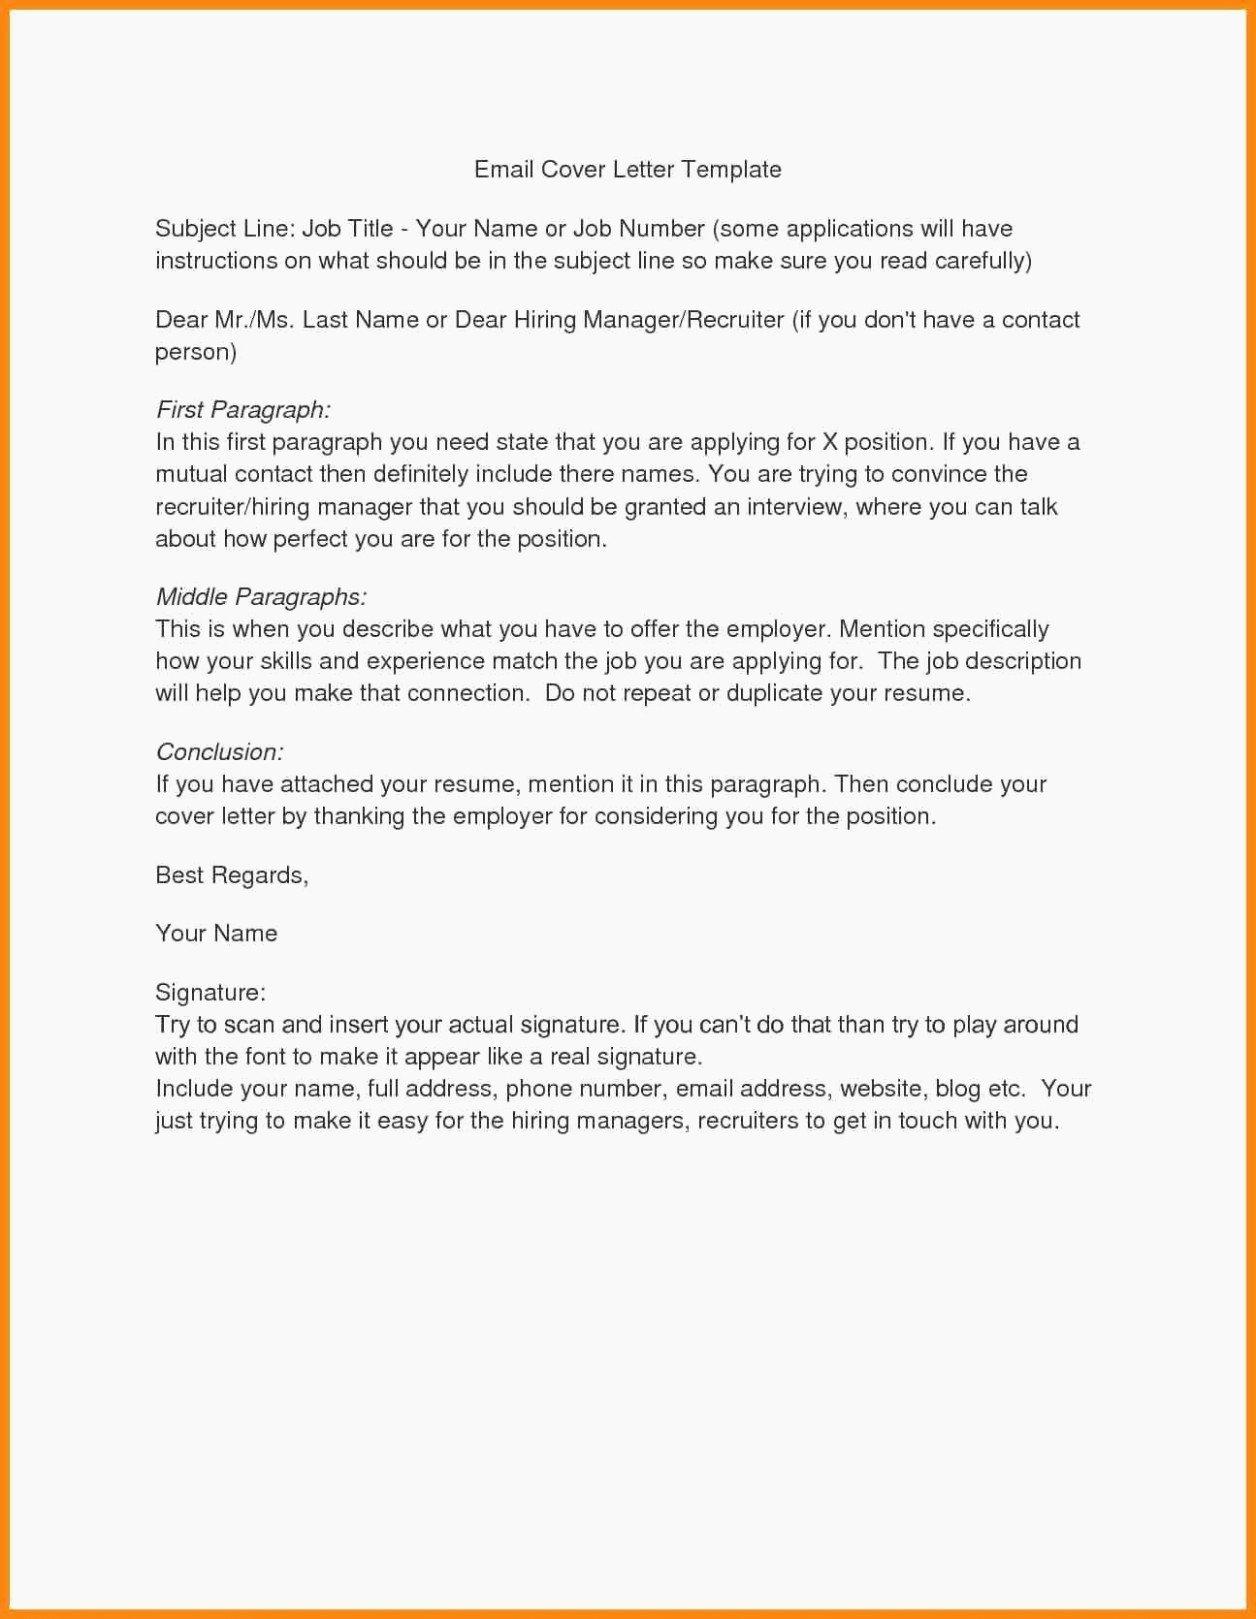 Wonderful Sending Resume to Recruiter Email Templates